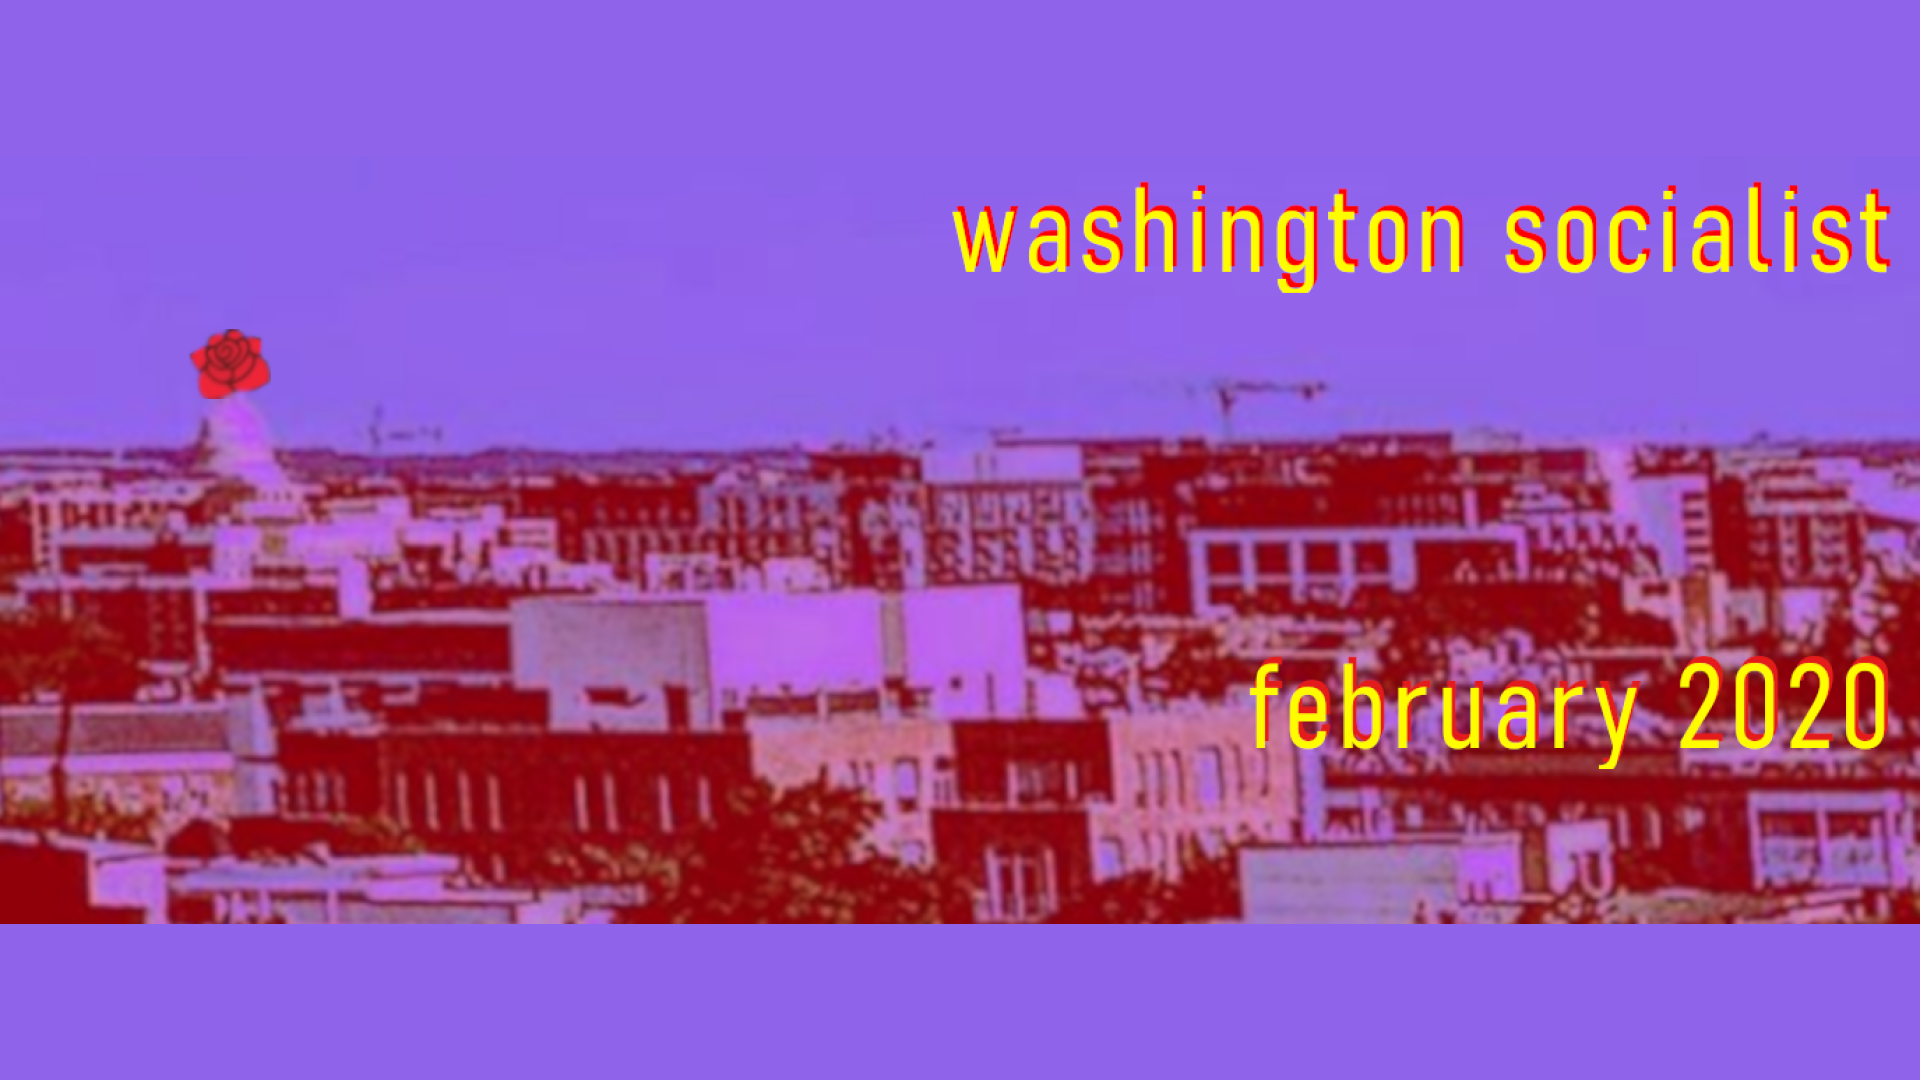 February 2020 Washington Socialist Cover